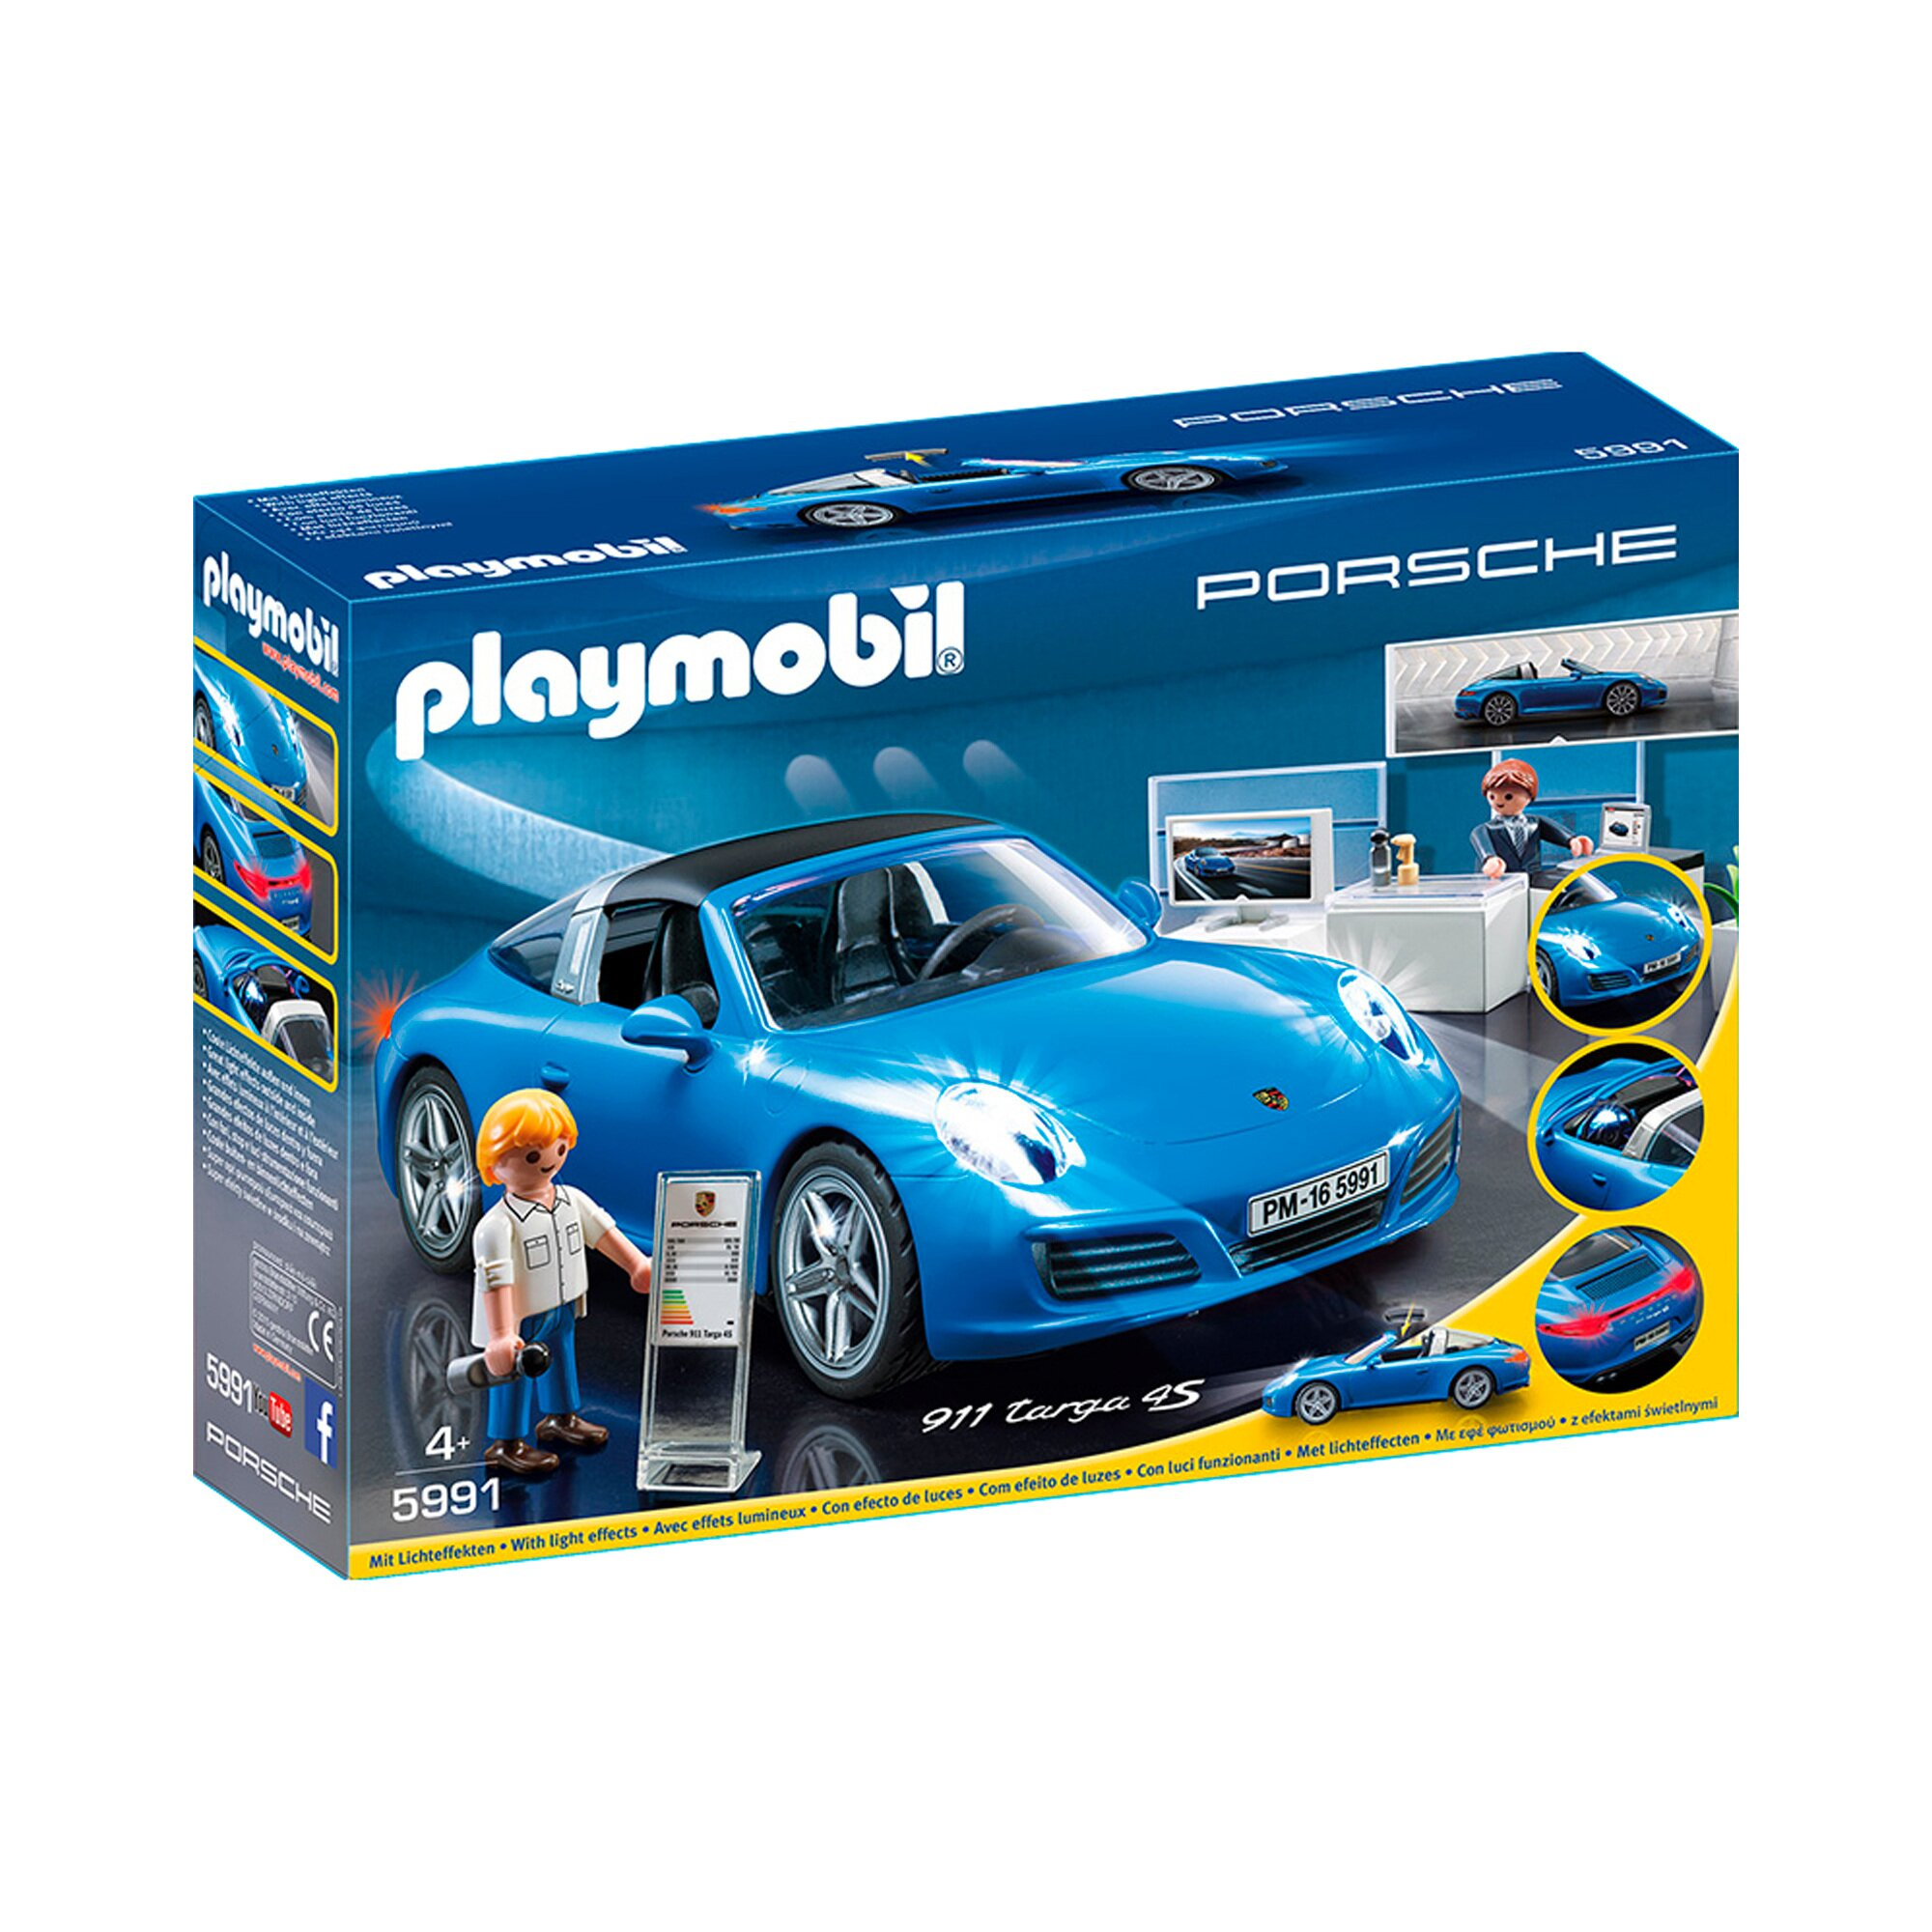 playmobil porsche 911 targa 4s 5991 preisvergleich. Black Bedroom Furniture Sets. Home Design Ideas